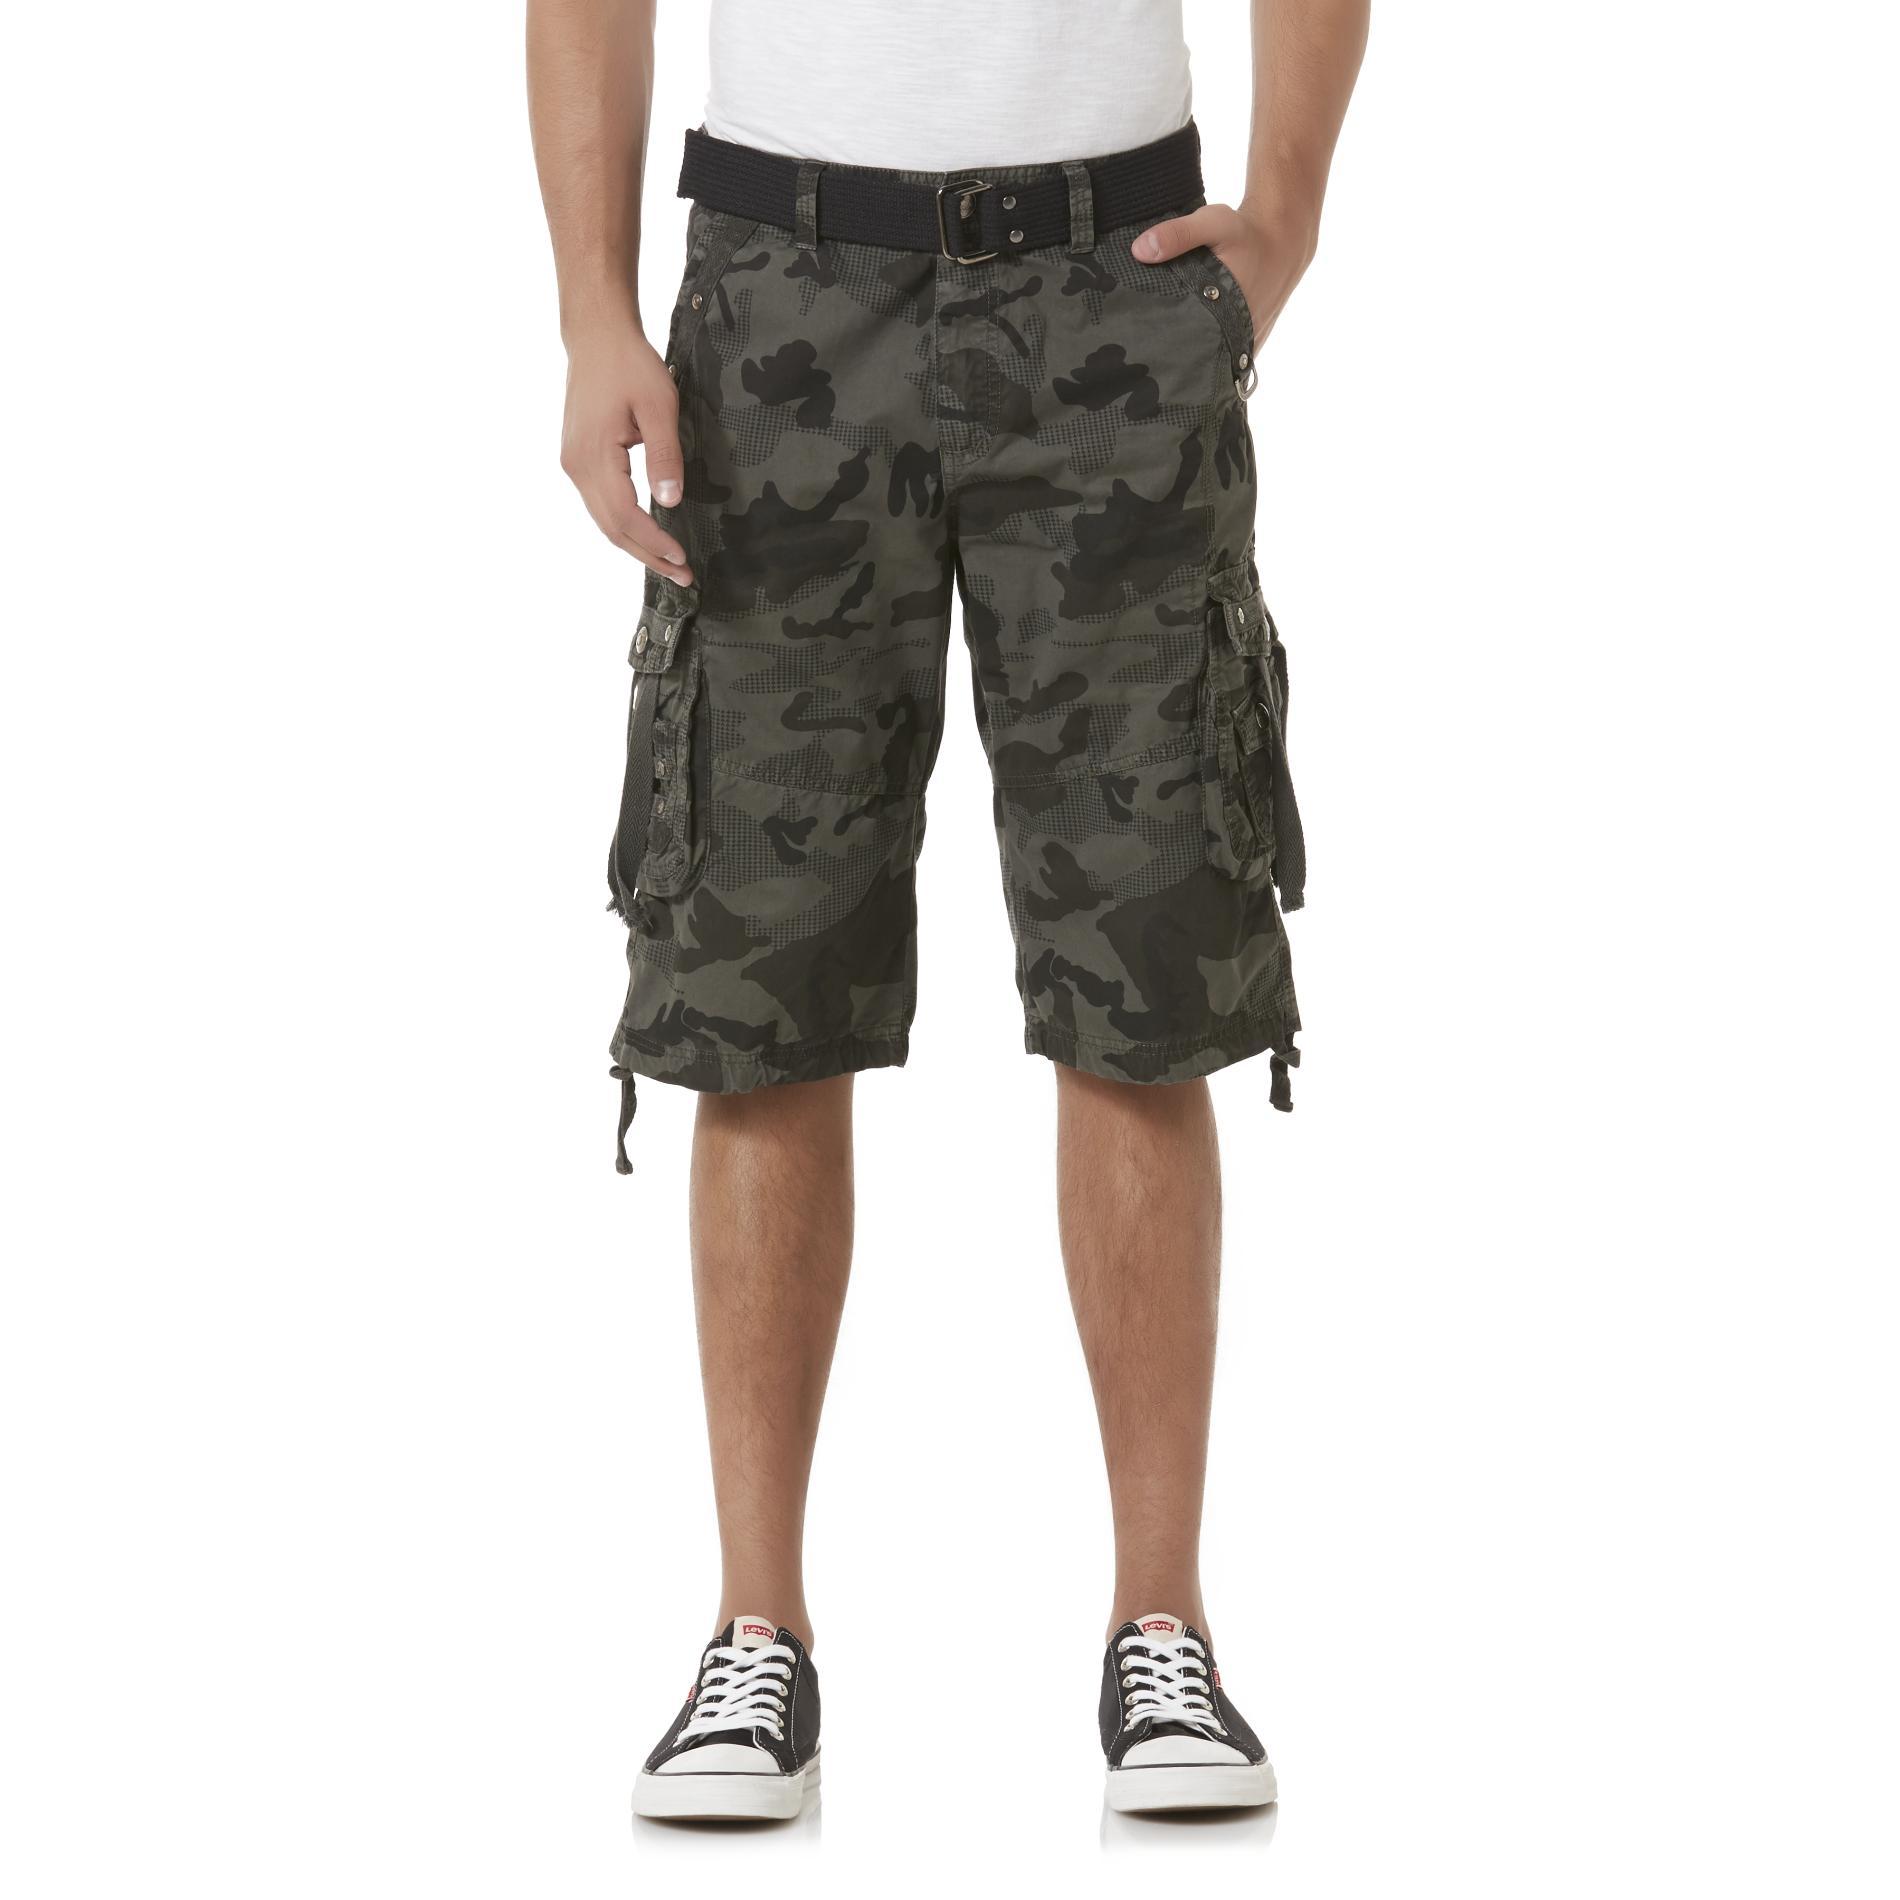 mens cargo shorts blue star menu0027s cargo shorts u0026 belt - camouflage cjhmhqf